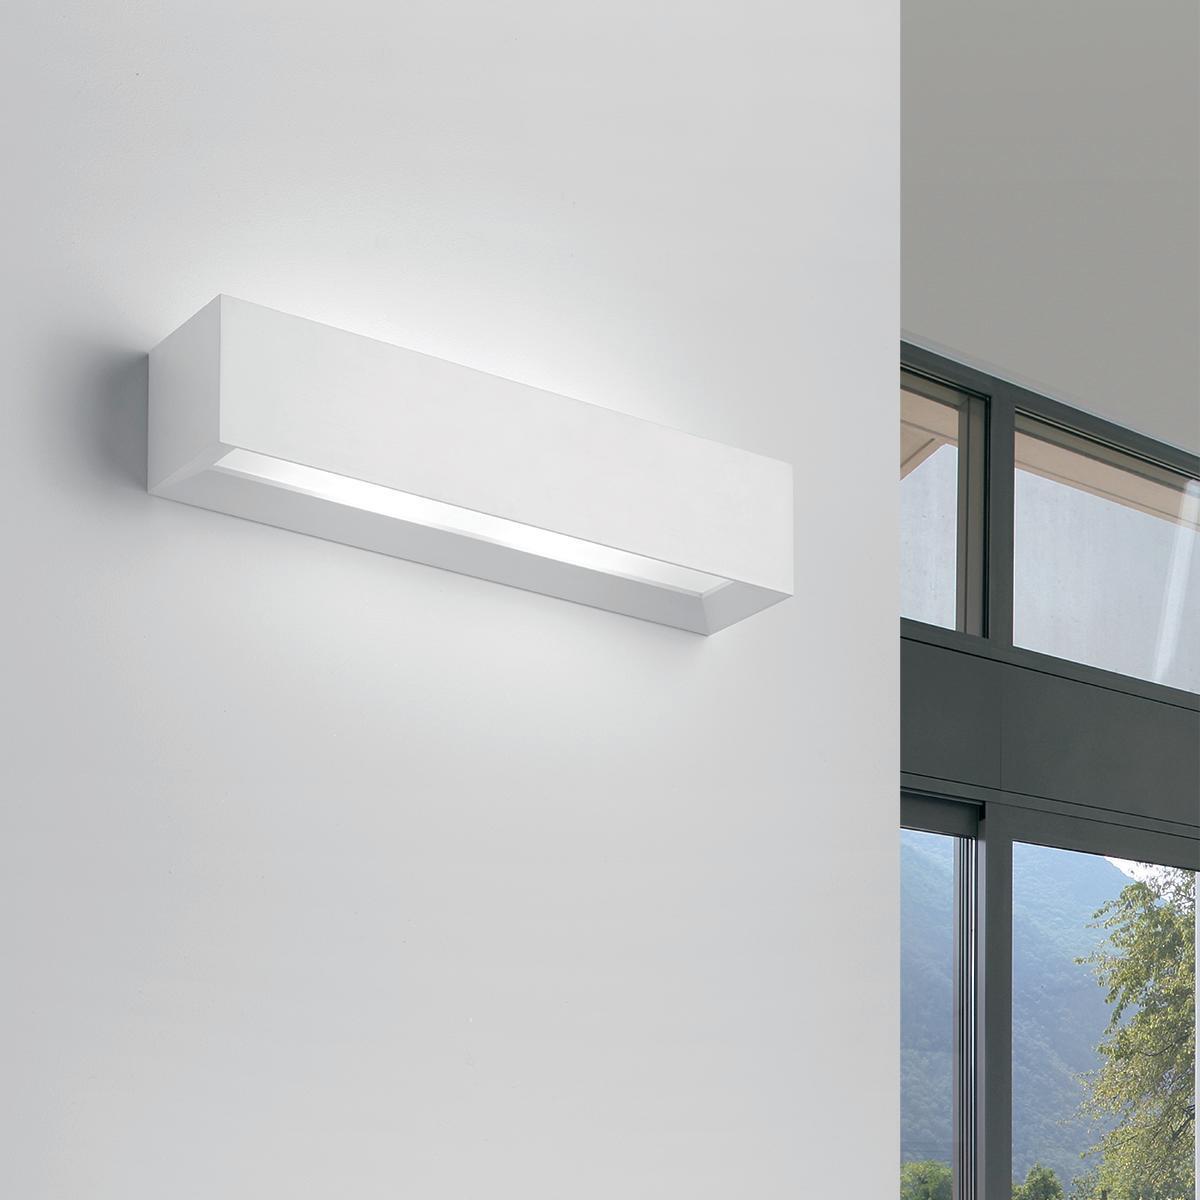 Applique design Hermione bianco, in gesso, 7x35 cm, 2 luci TECNICO - 1